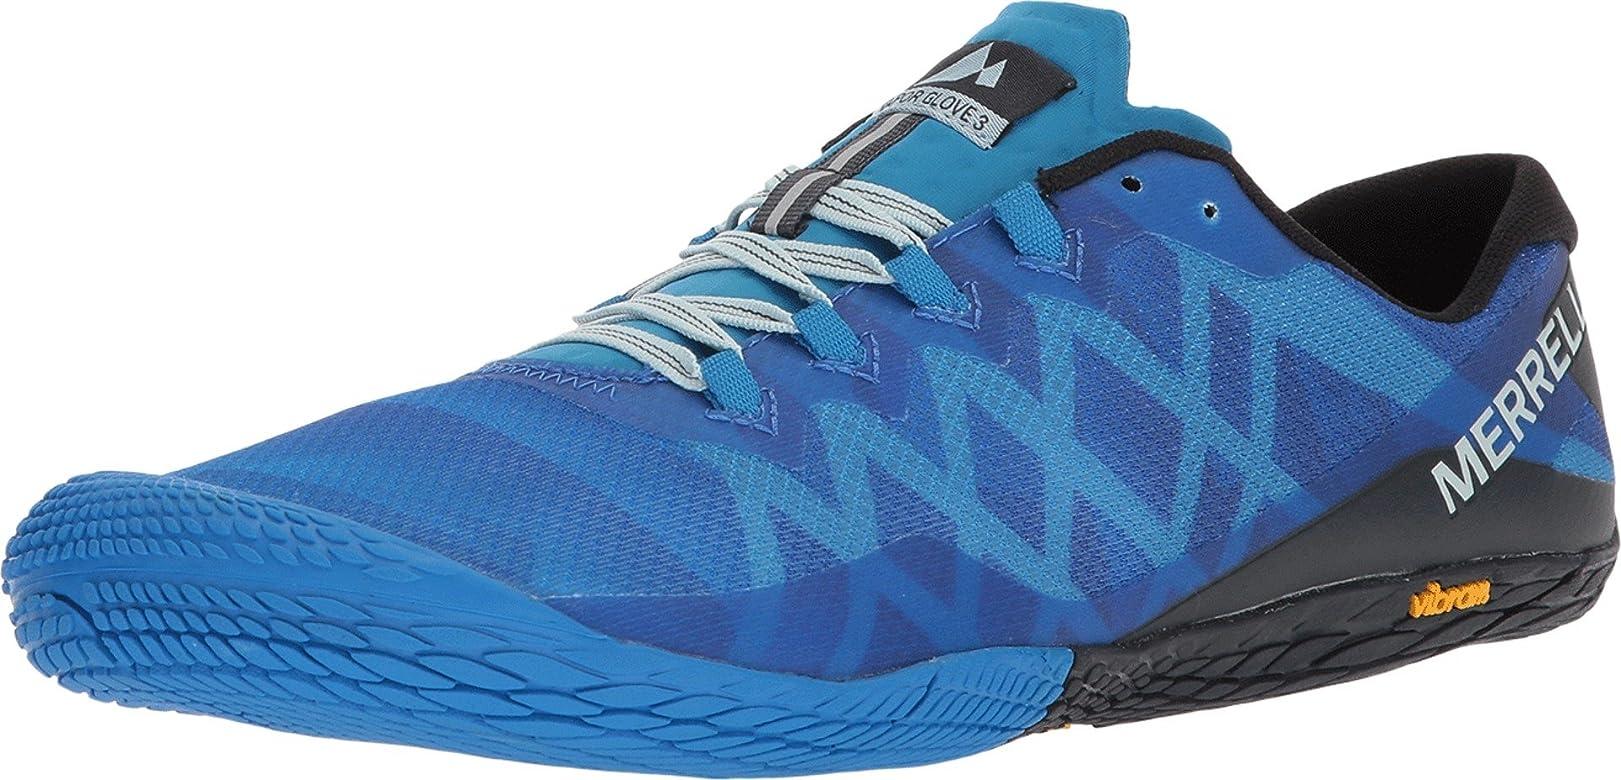 Merrell Vapor Glove 3, Zapatillas Deportivas para Interior para Hombre, Azul (Directoire Blue), 41.5 EU: Amazon.es: Zapatos y complementos